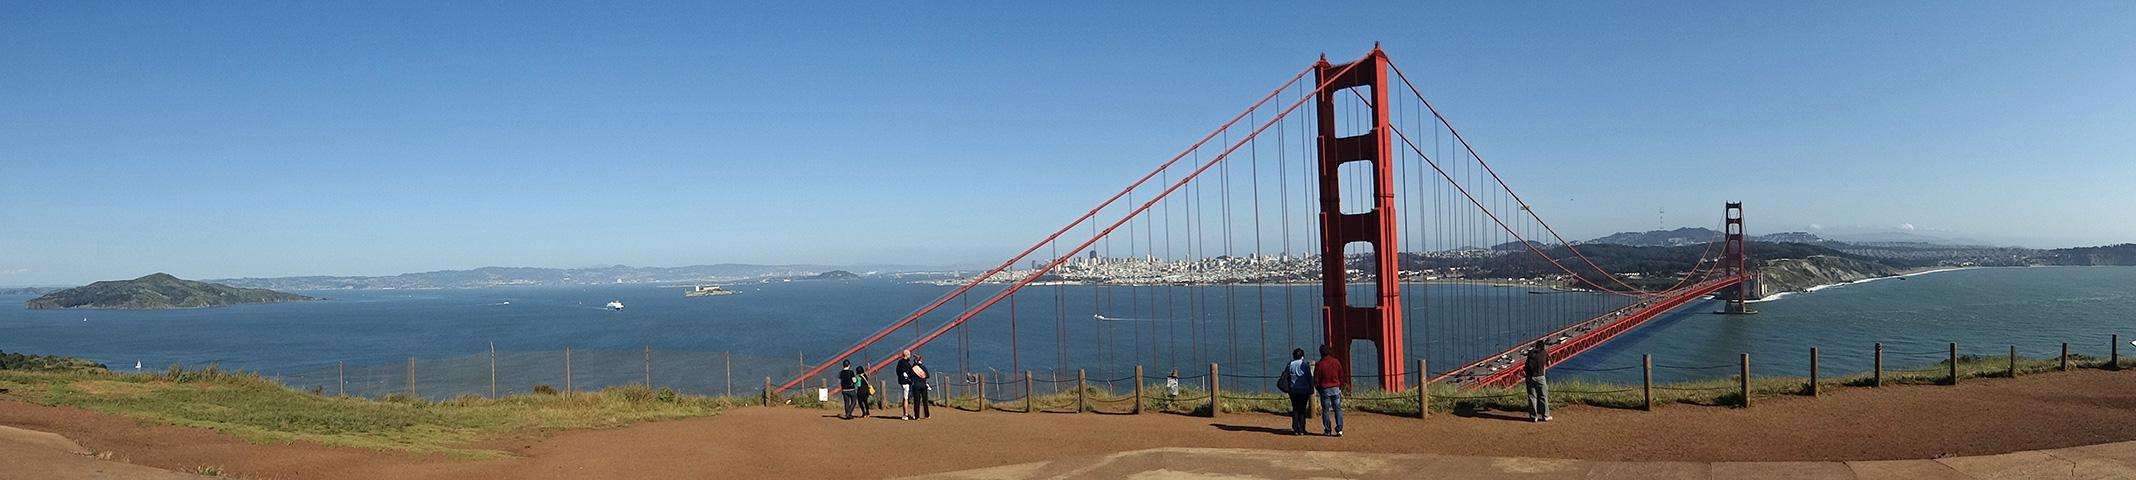 Golden Gate Bridge のパノラマ